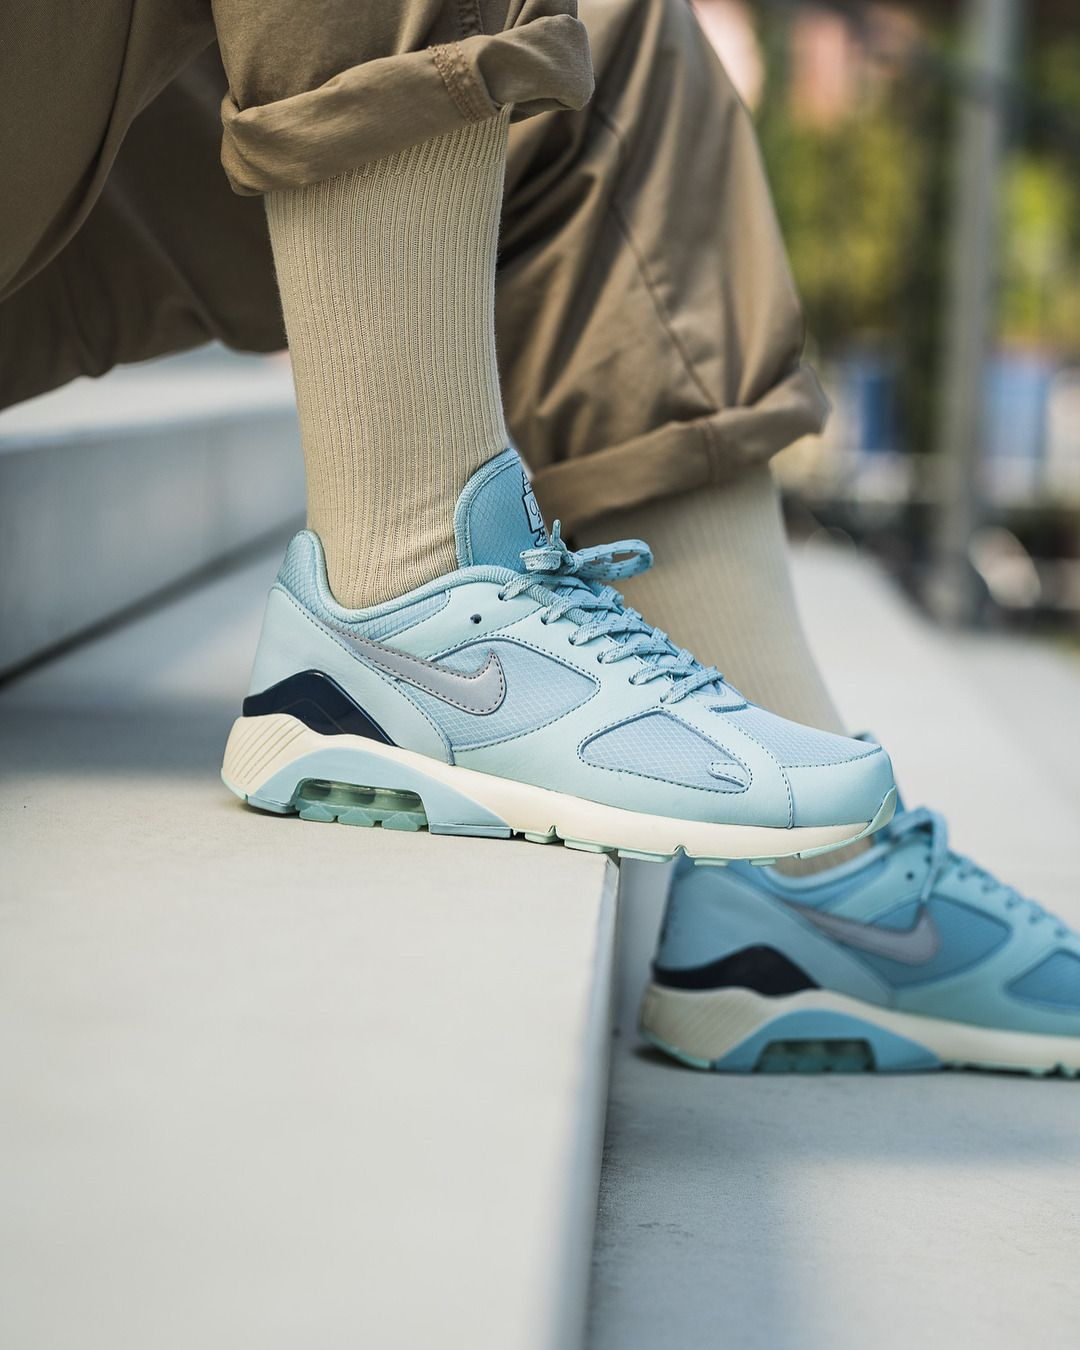 UNSTABLEFRAGMENTS.COM | Sneakers nike air max, Air max sneakers ...